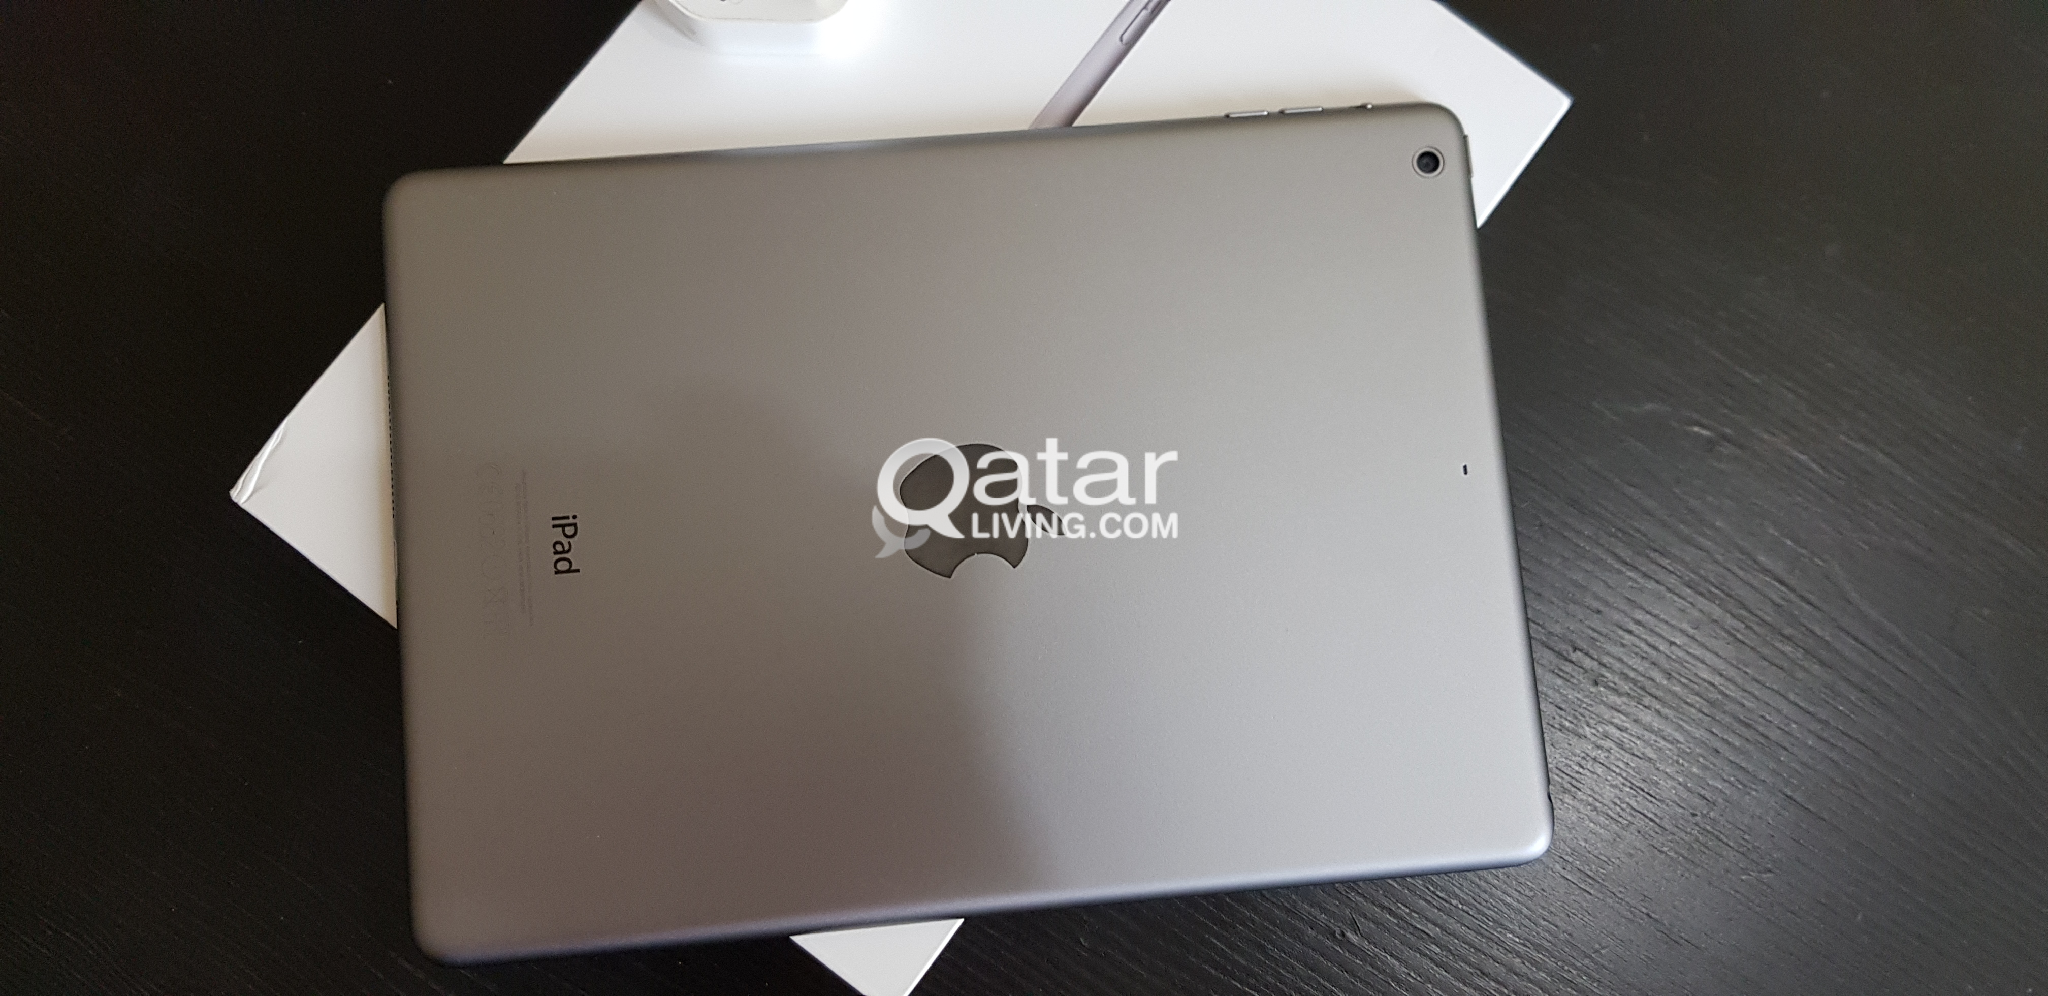 Ipad Air 32Gb for sale